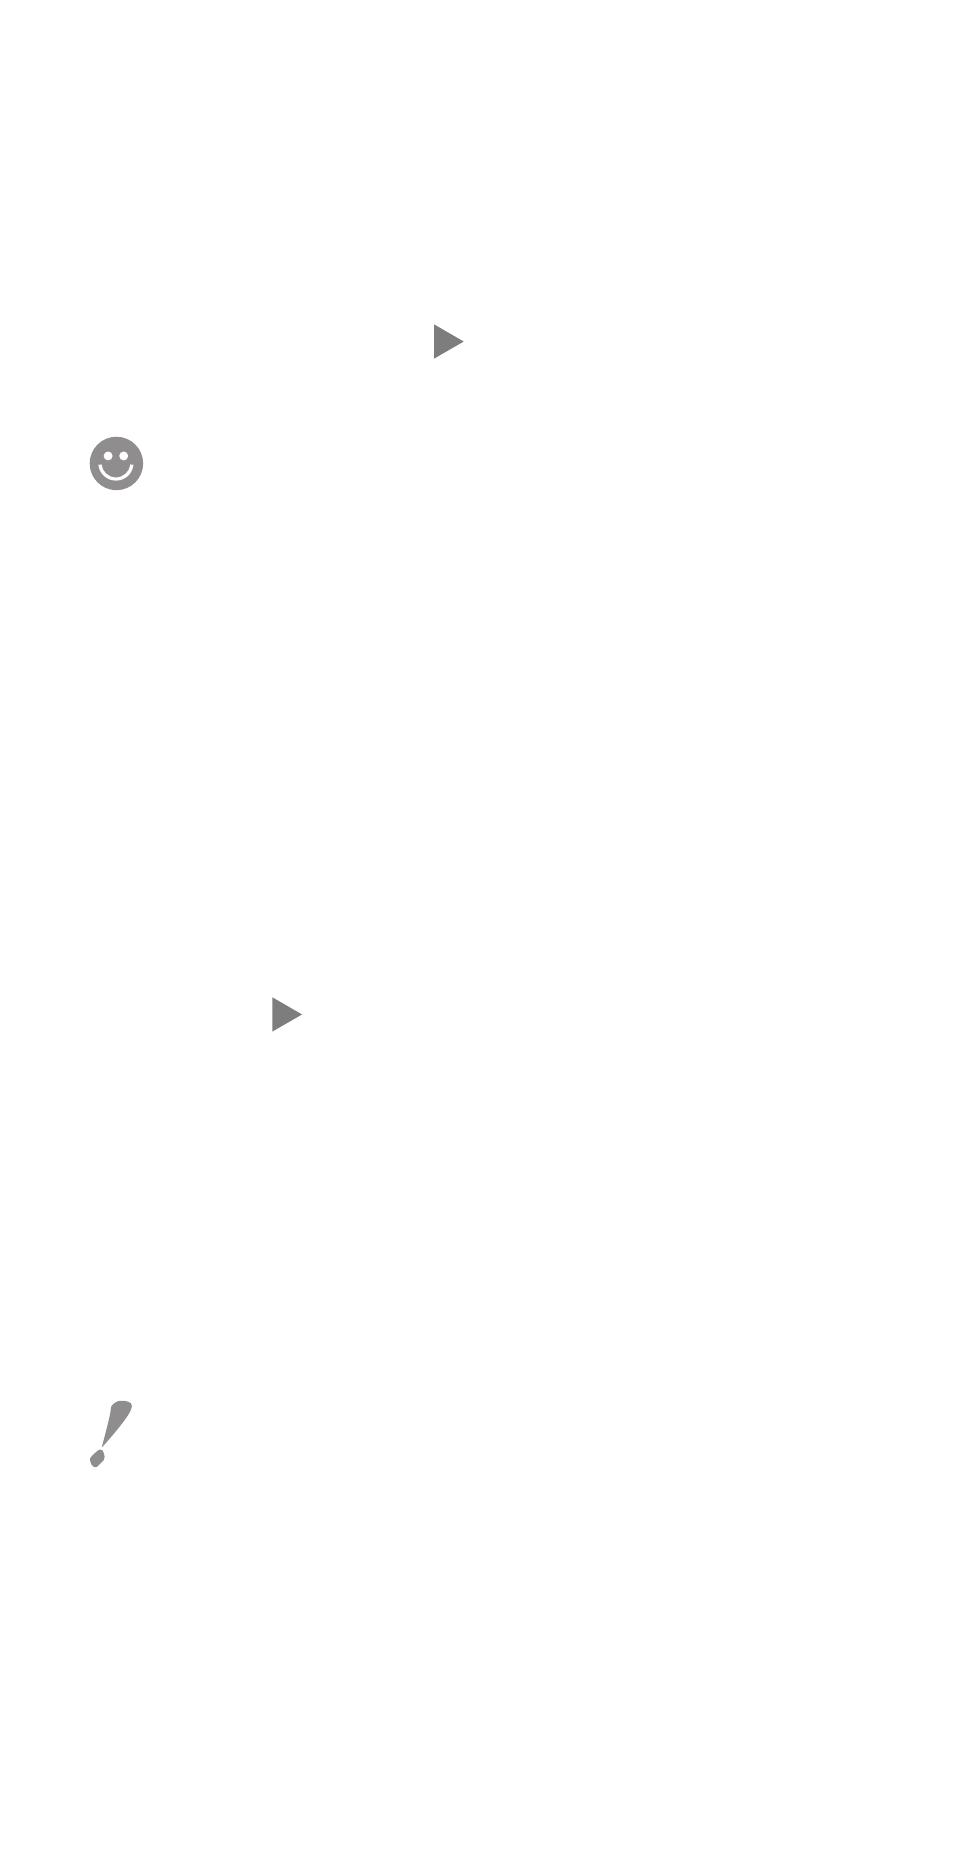 polar m22 user manual page 45 60 also for m51 rh manualsdir com M22 Sign M22 Laser